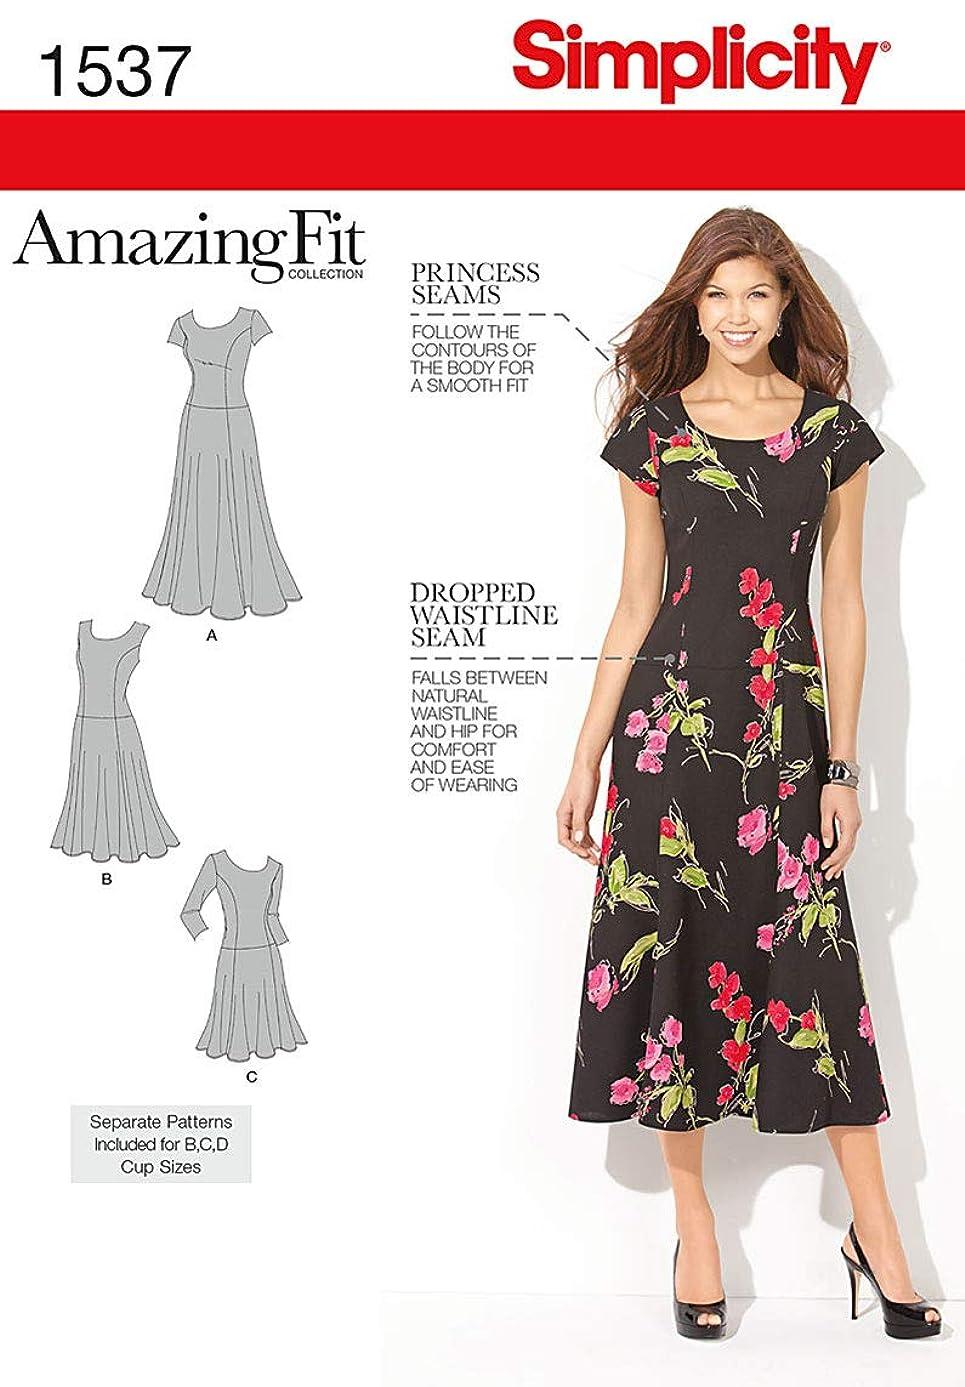 Simplicity Amazing Fit Pattern 1537 Women's Dress in Three Lengths Sizes 20W-28W